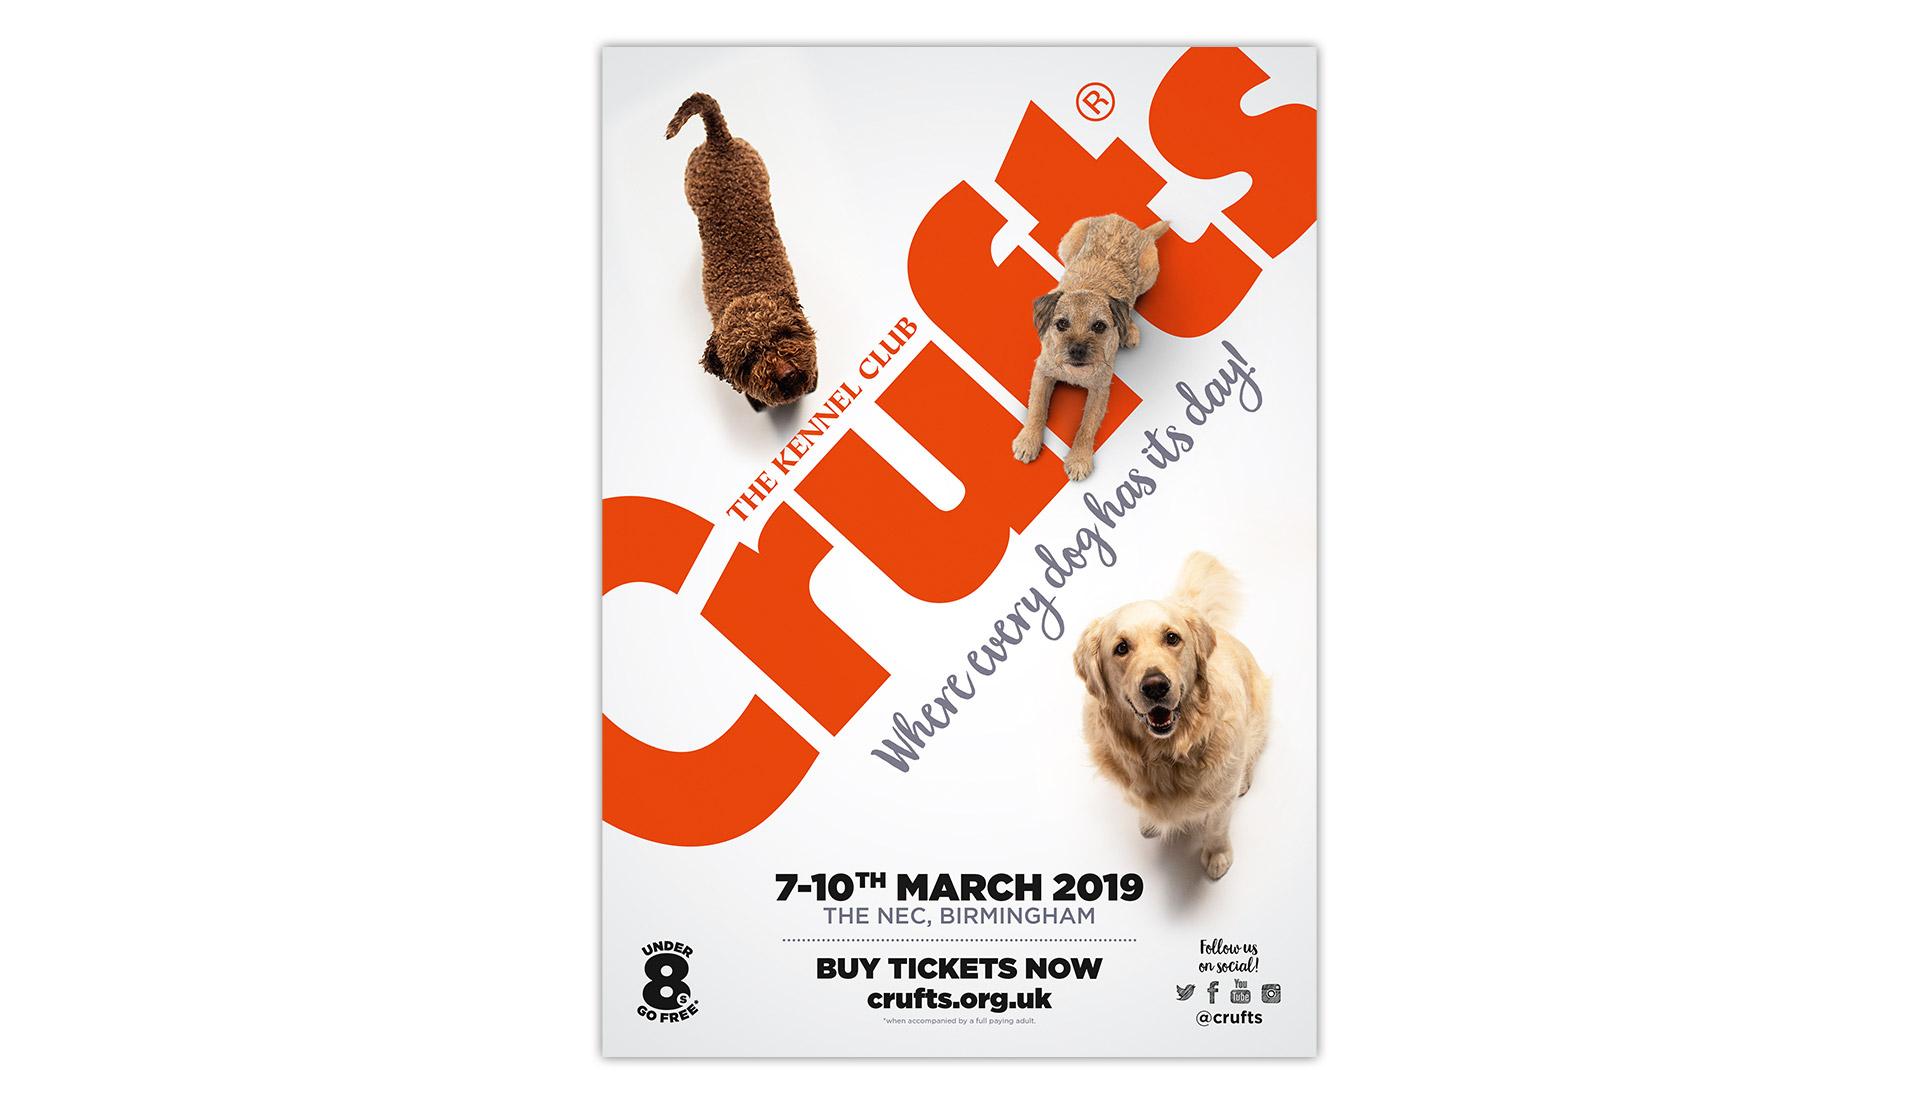 Crufts2019_Panel_1.jpg